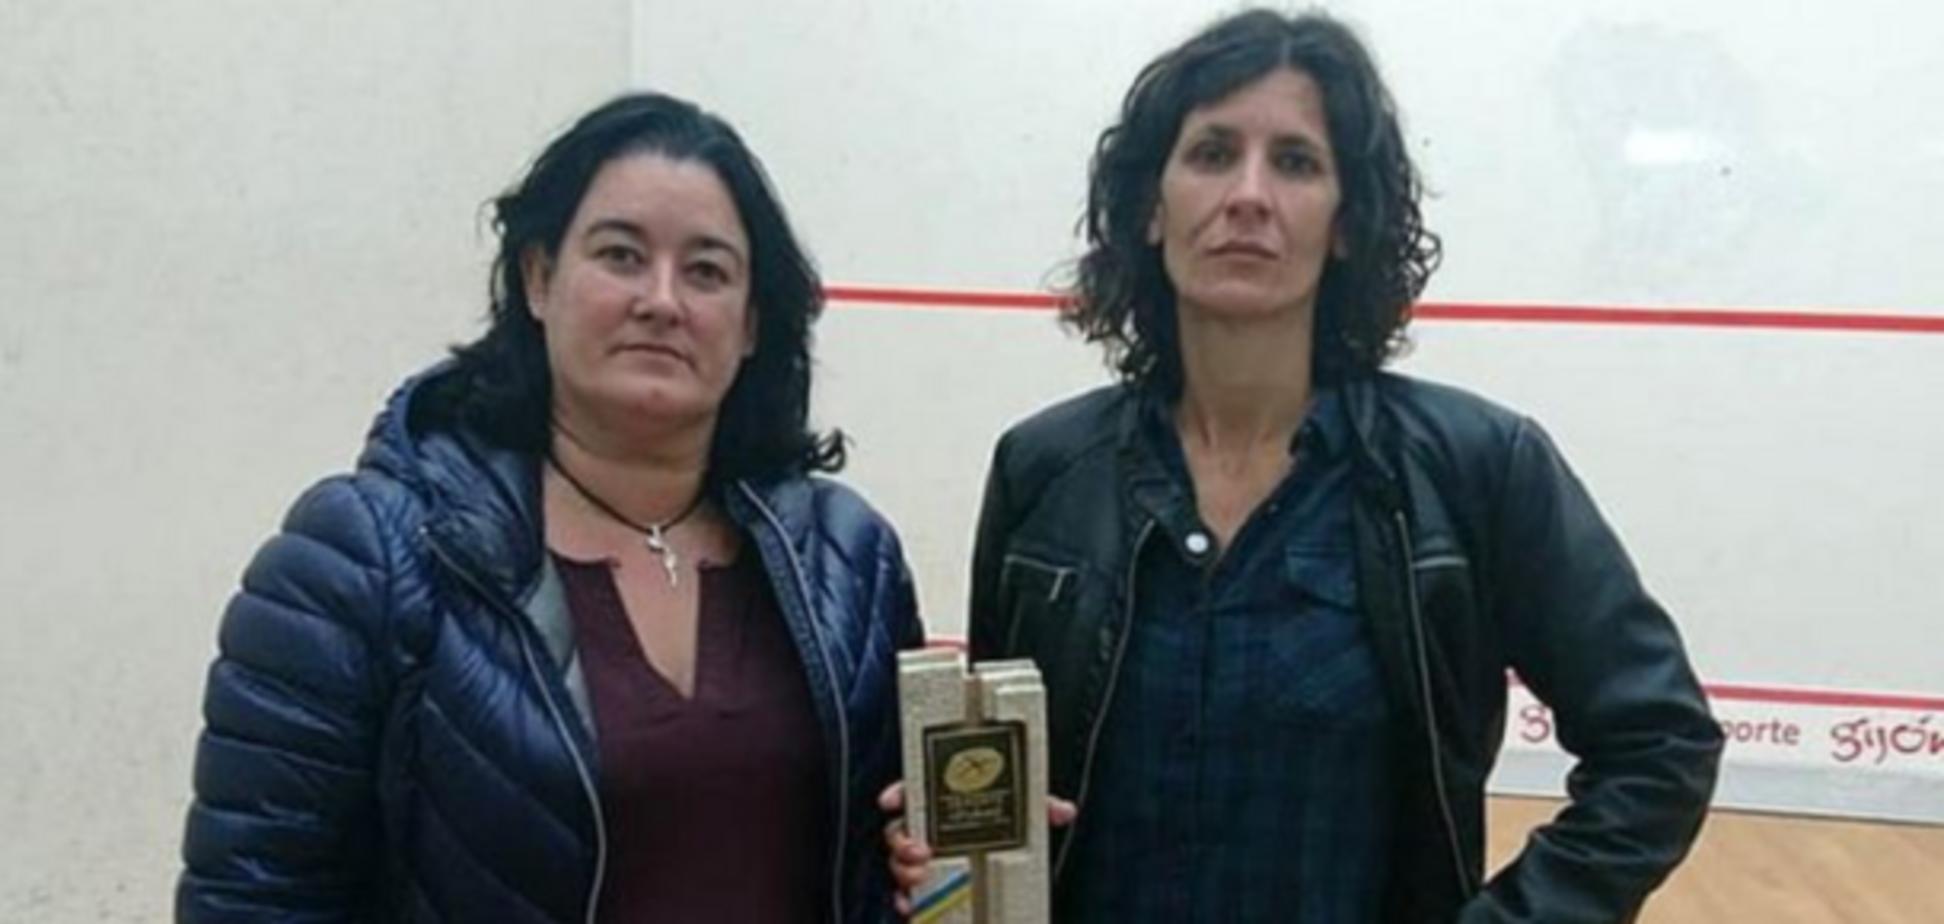 Победительниц крупного турнира наградили секс-игрушками - фотофакт